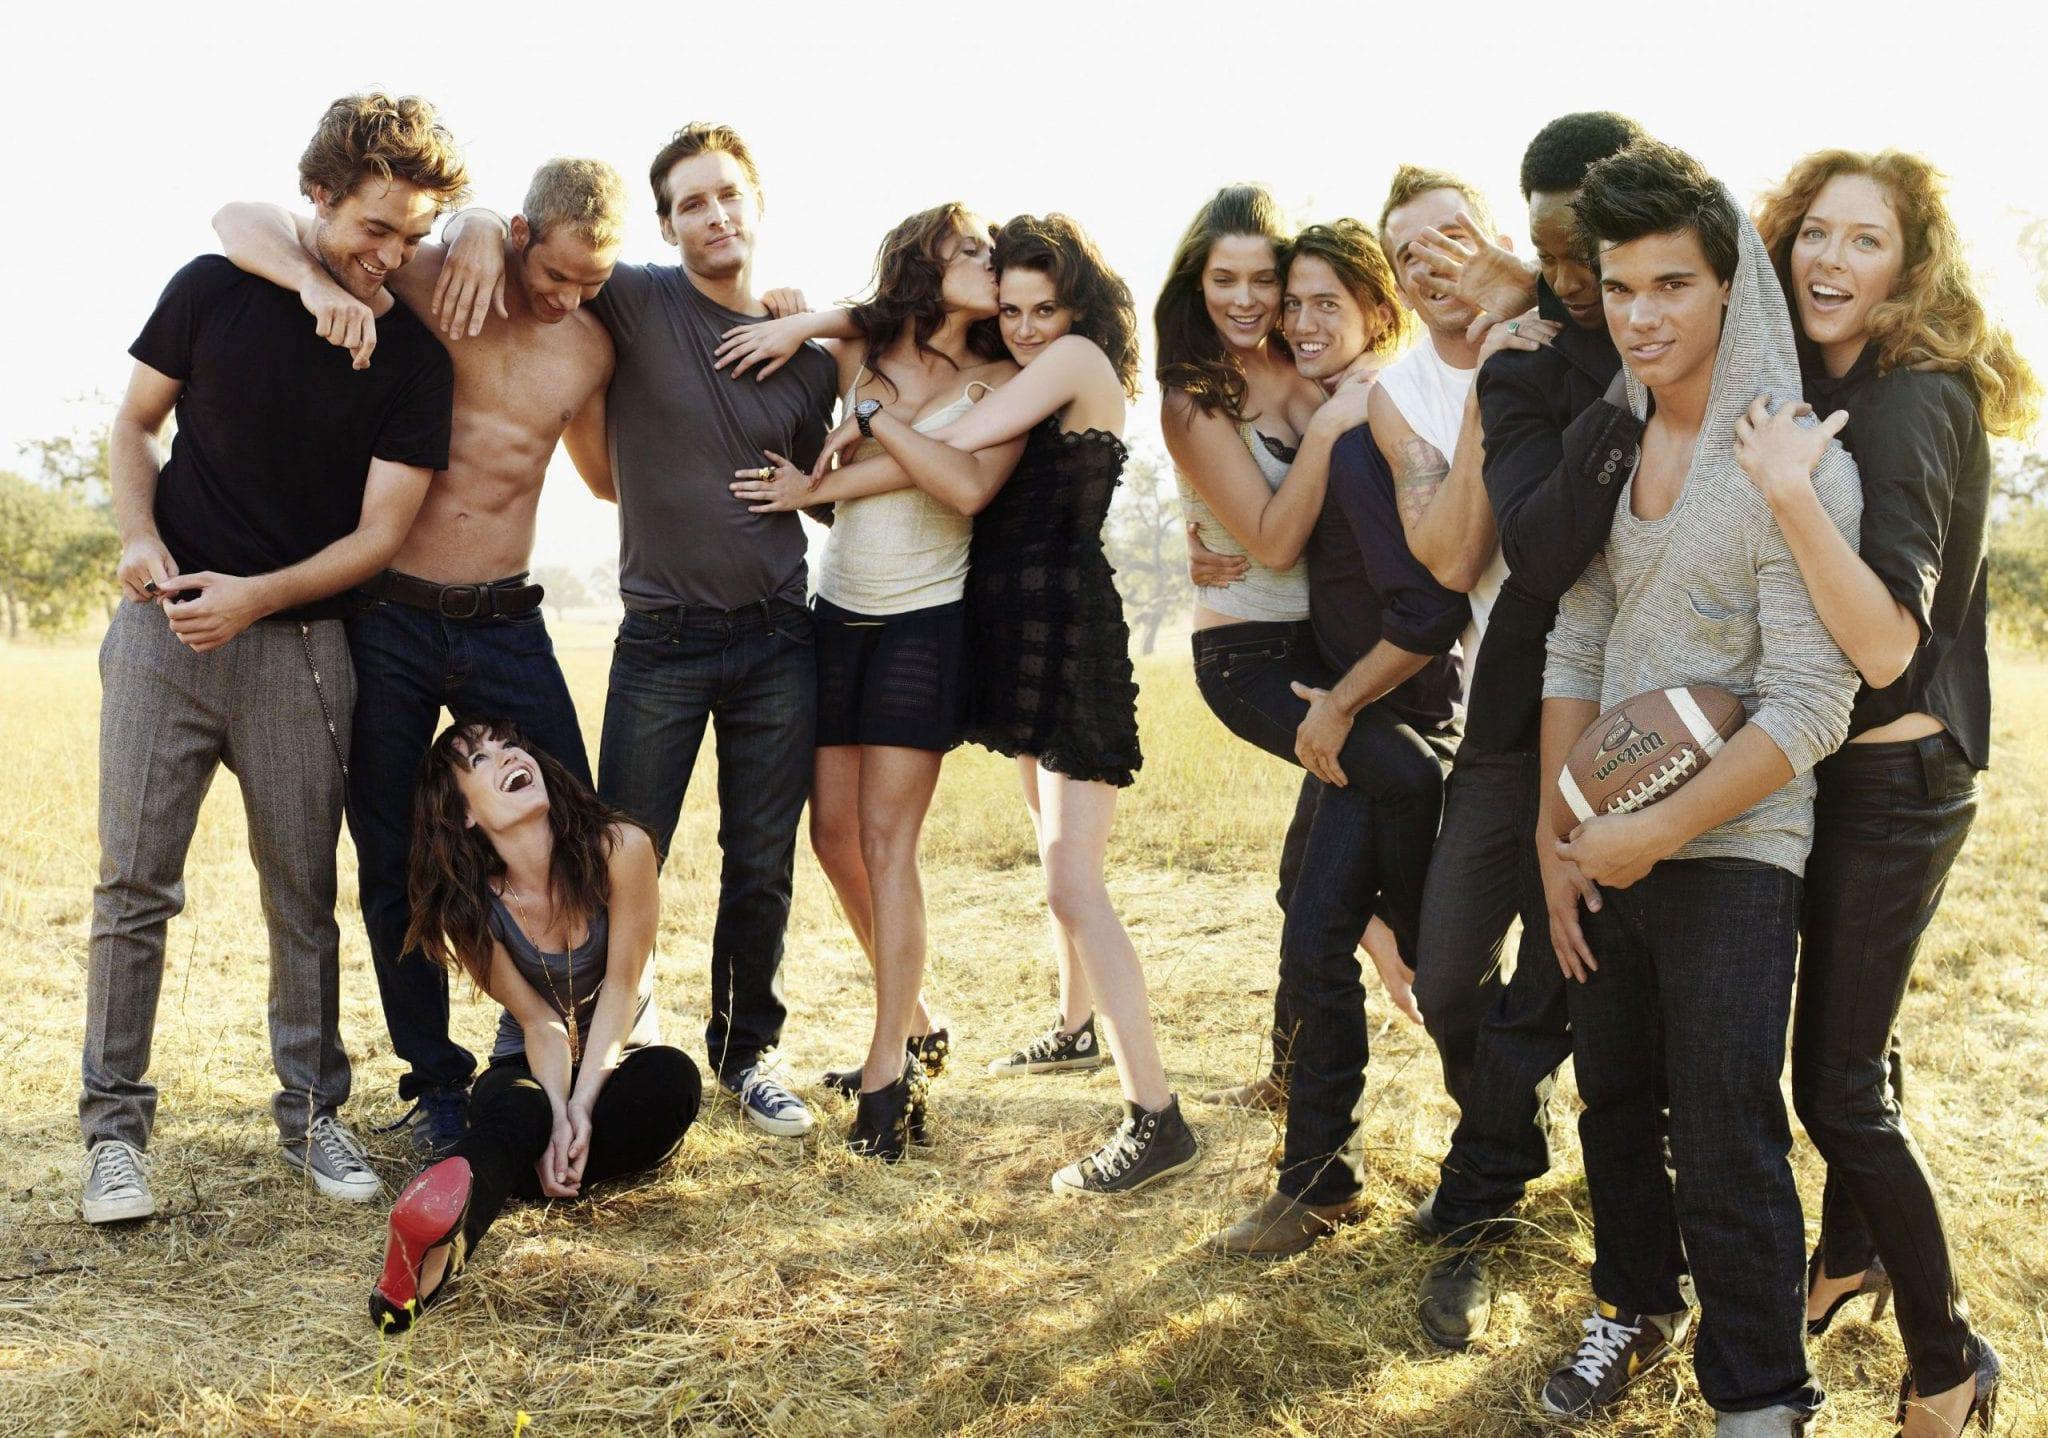 CinemaTivu: Parte la saga Twilight (Usa 2008), con Kristen Stewart e Robert Pattinson, su Italia1